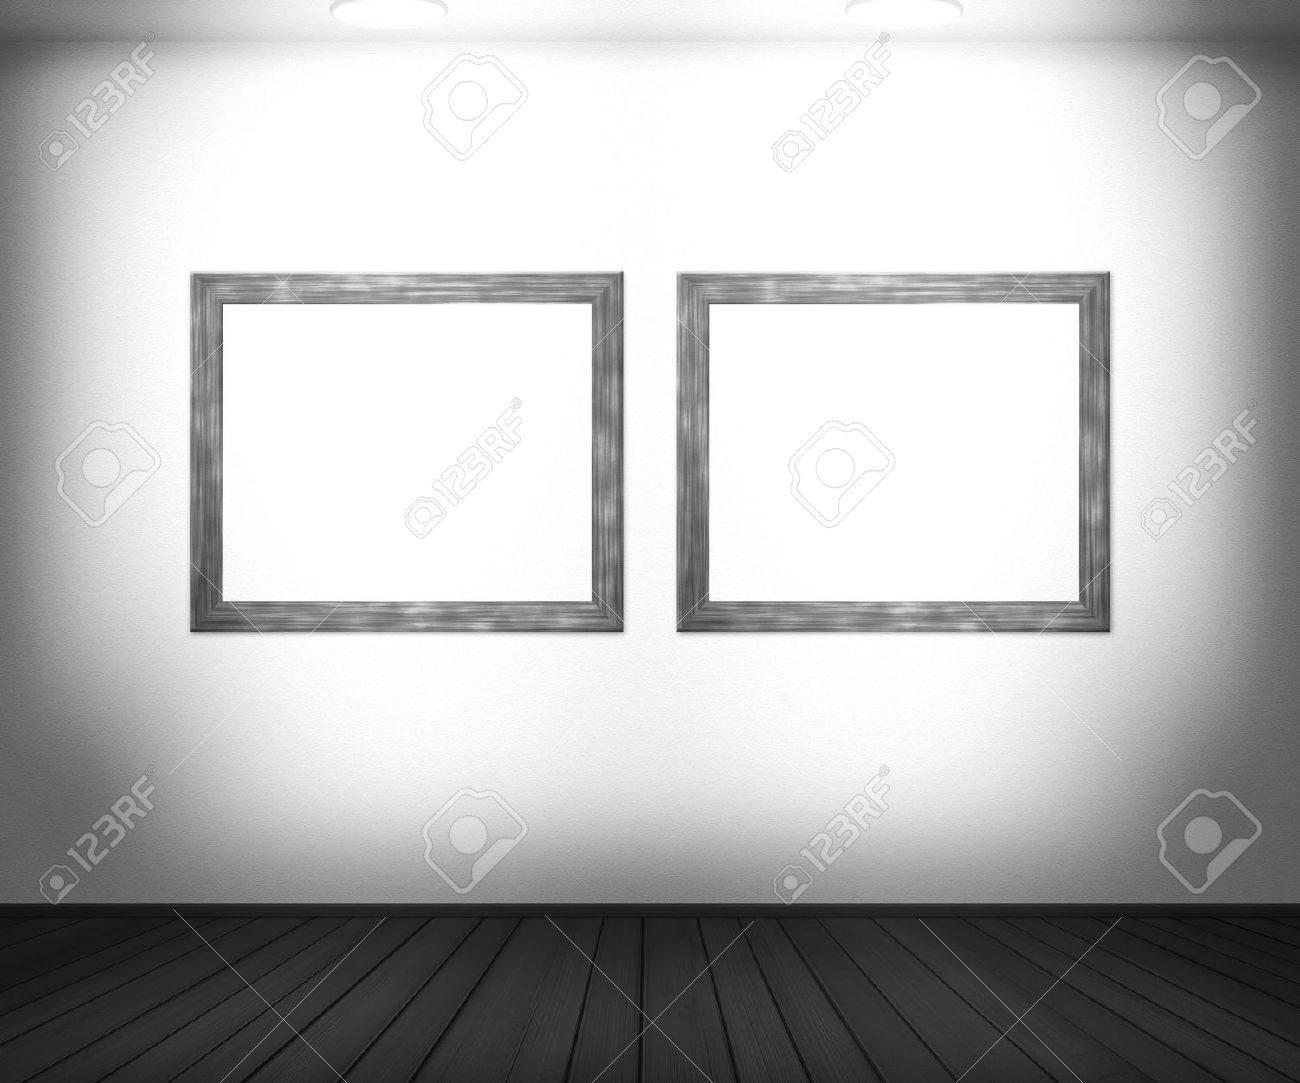 White Gallery Background Stock Photo - 14205004